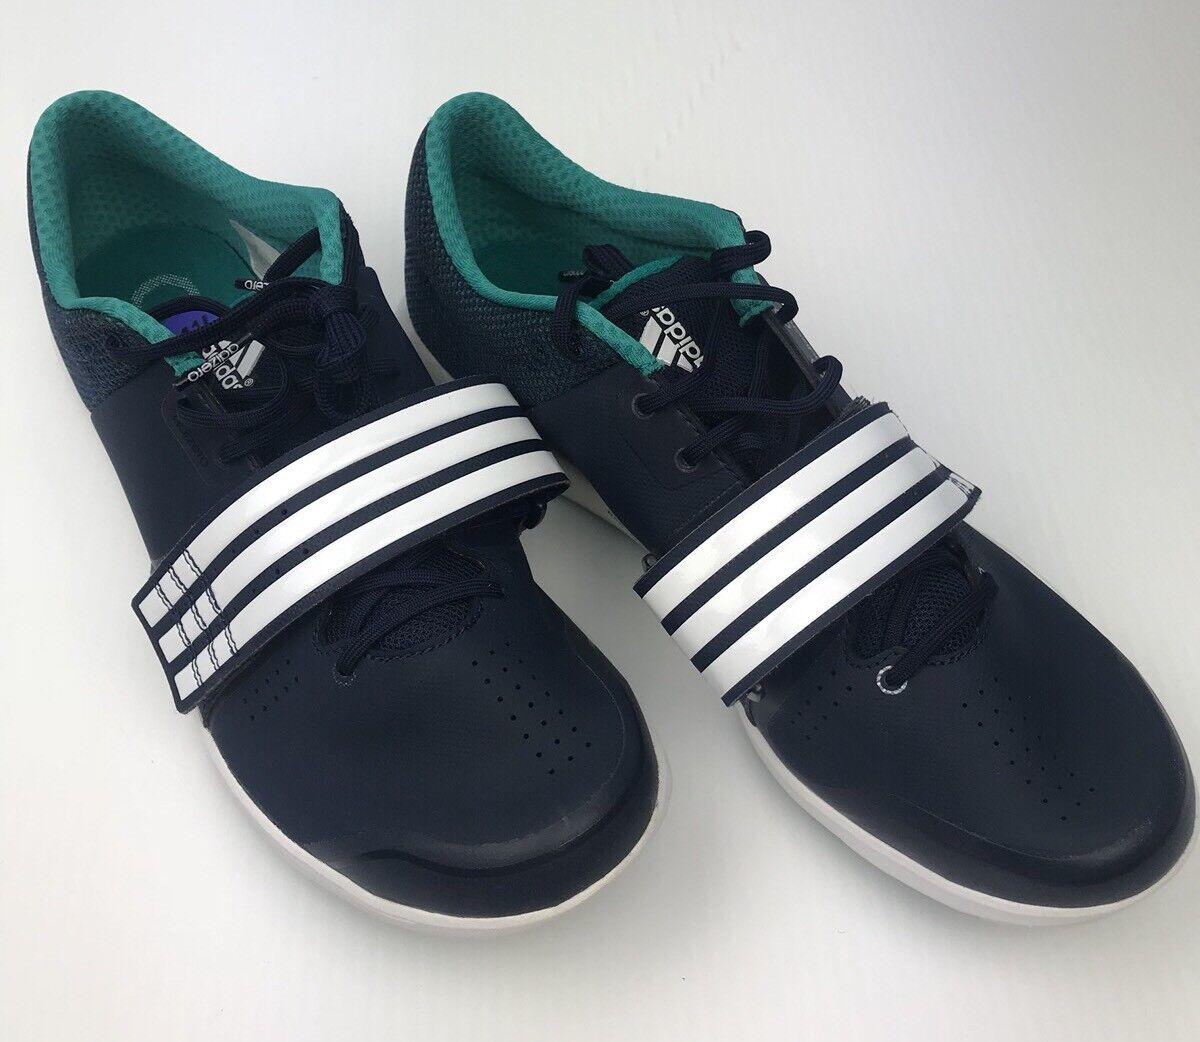 New Adidas Performance Adizero TJ TJ TJ PV bluee Running shoes AF5664 Track Size 11.5 b3d708